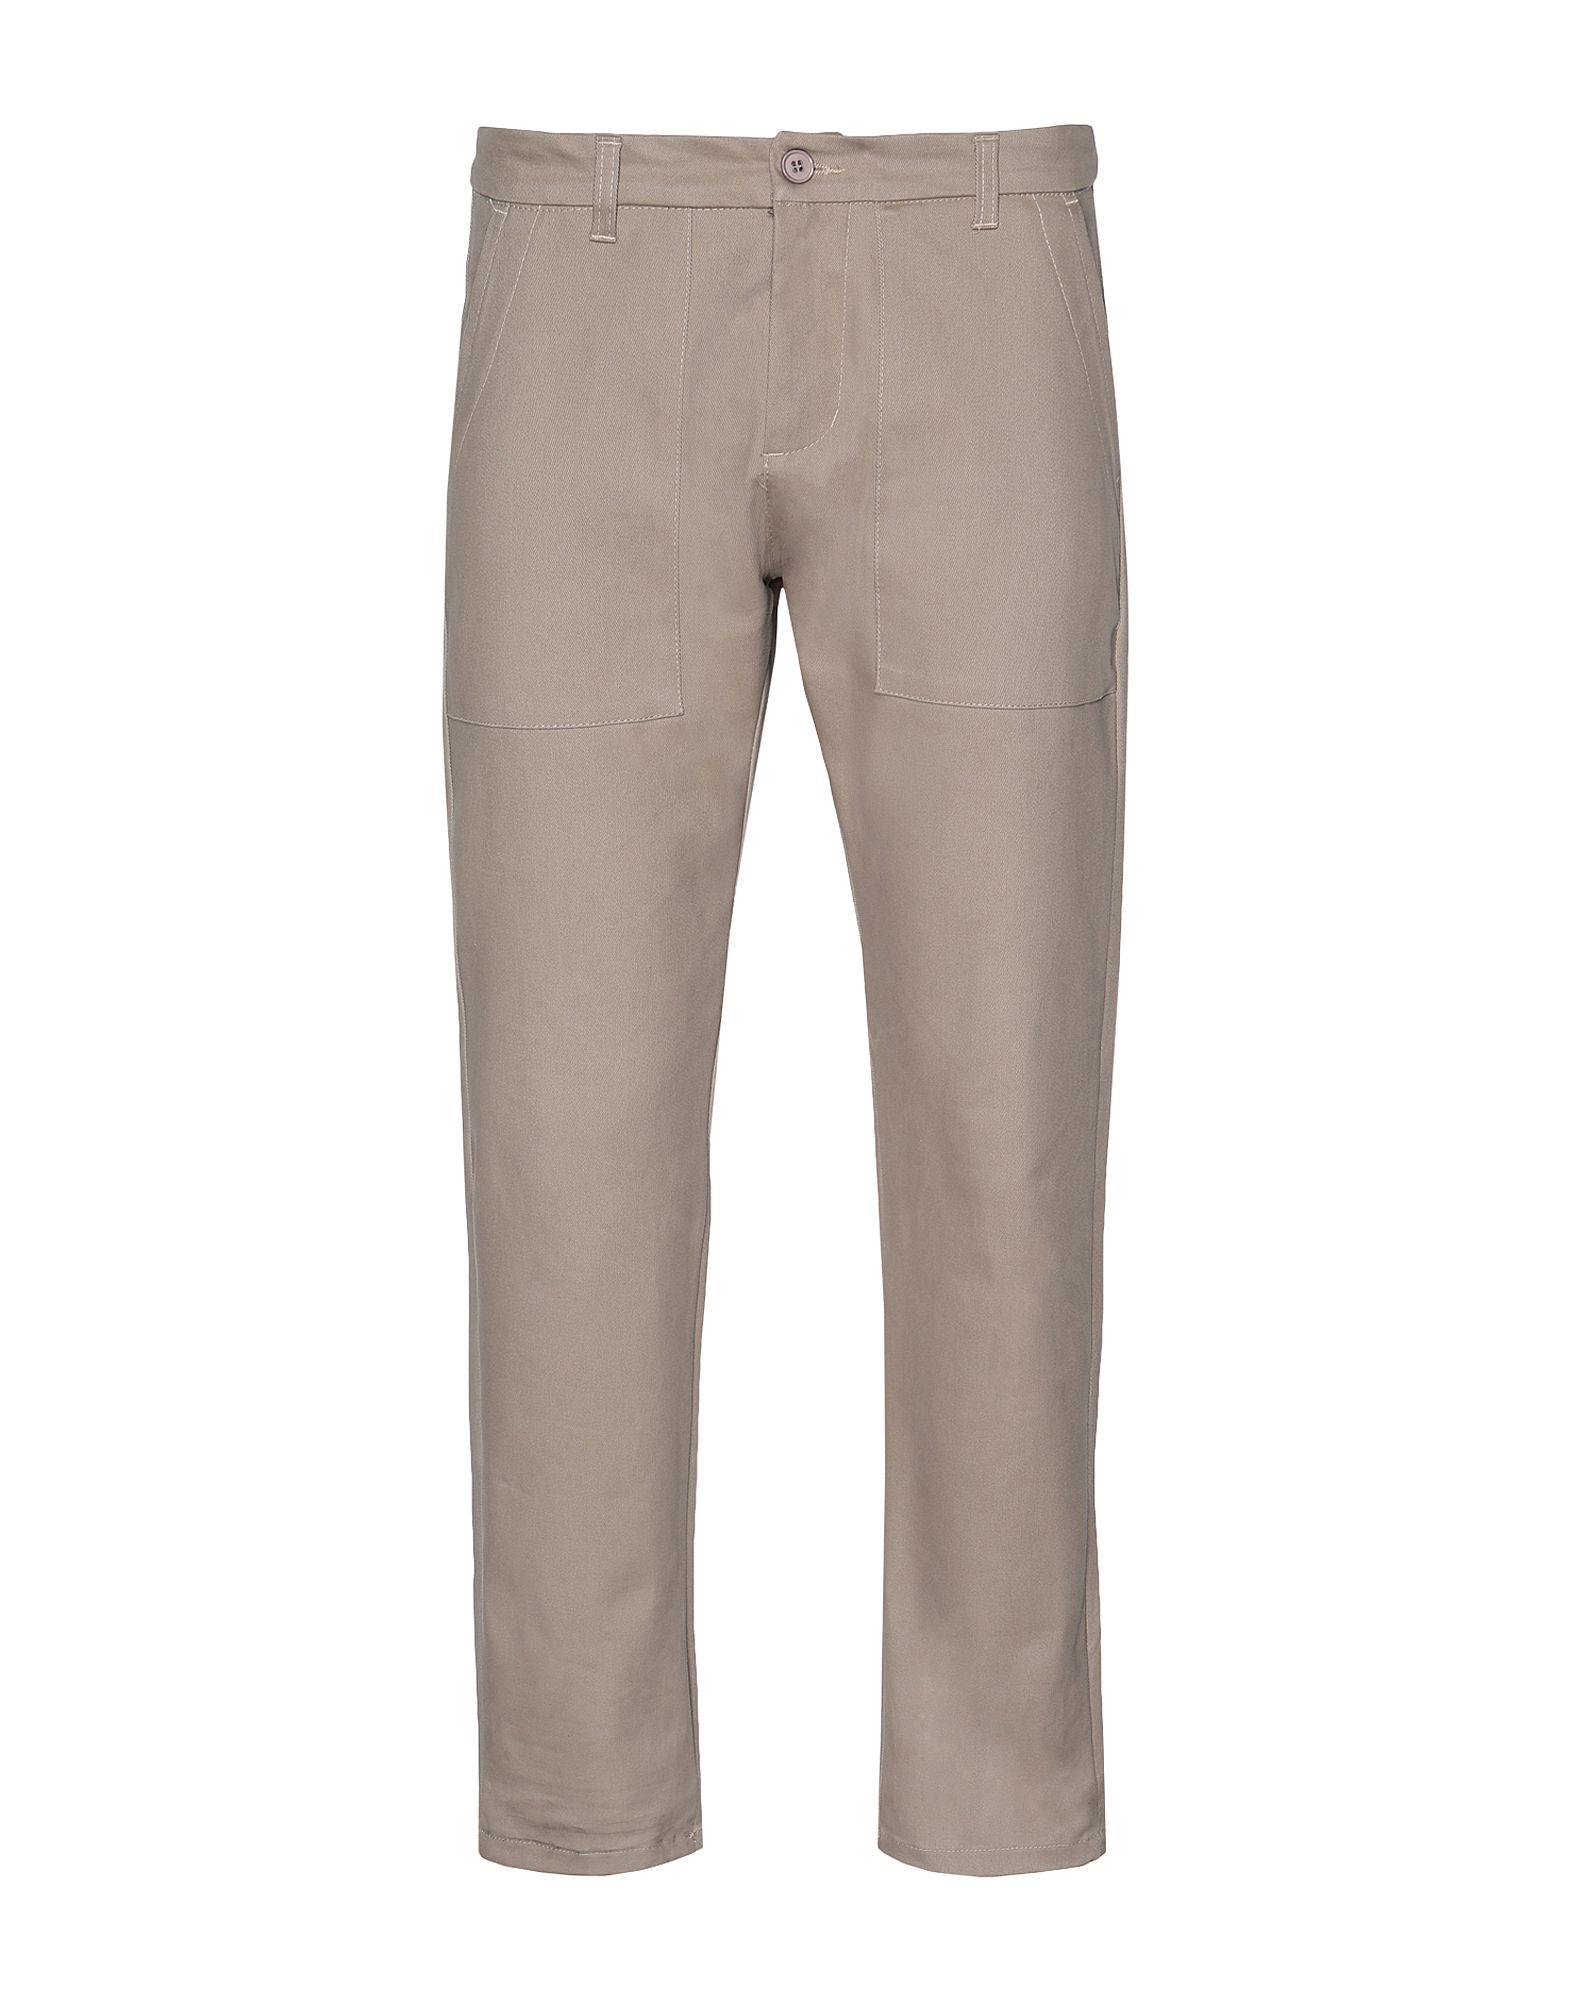 8 by YOOX Повседневные брюки jupe by jackie хлопковые брюки